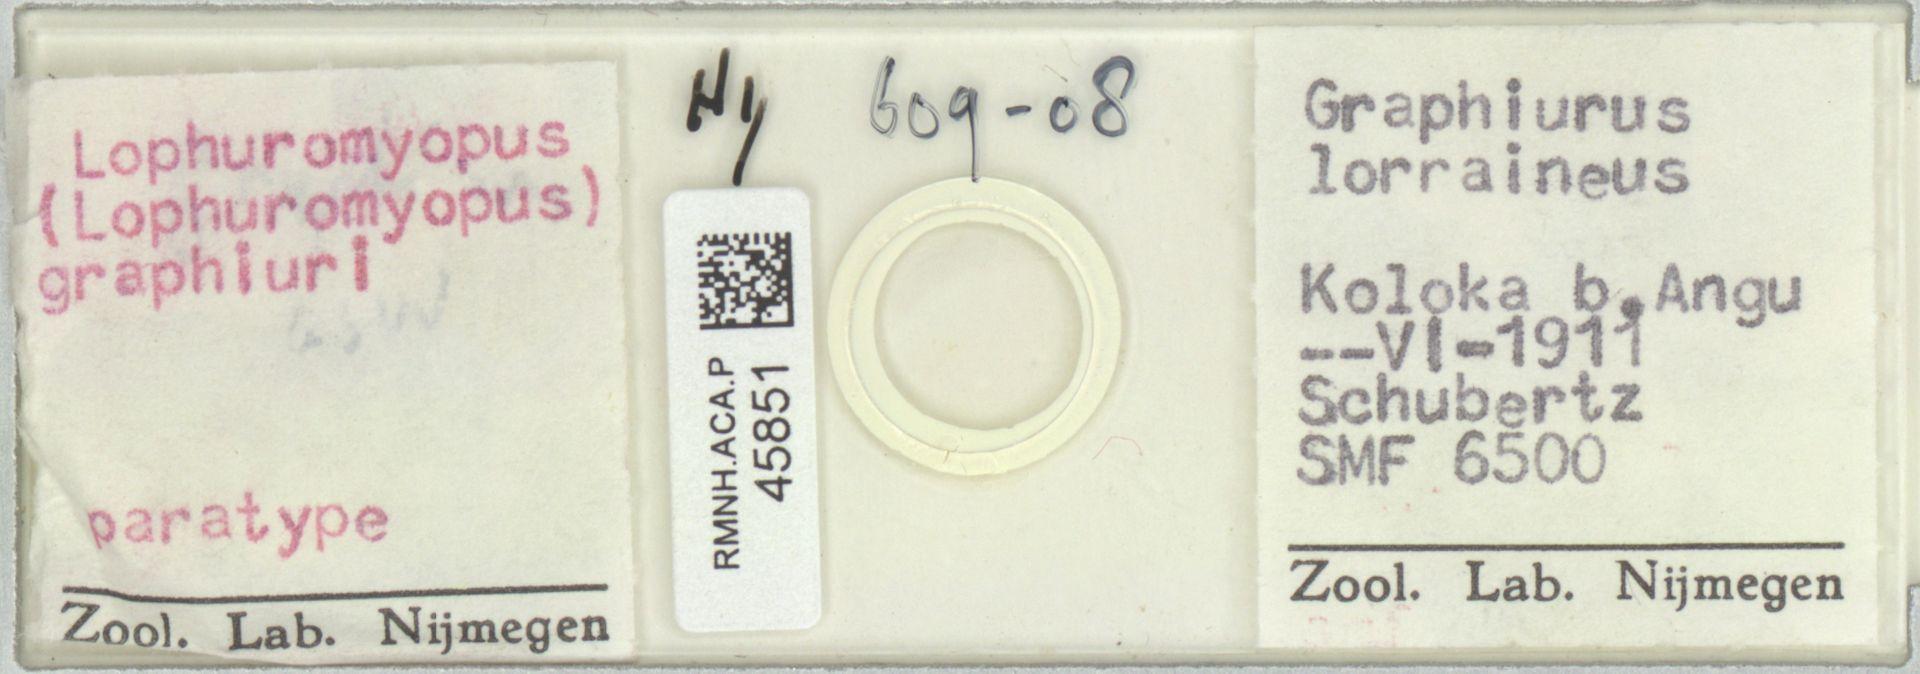 RMNH.ACA.P.45851 | Lophuromyopus (Lophuromyopus) graphiuri